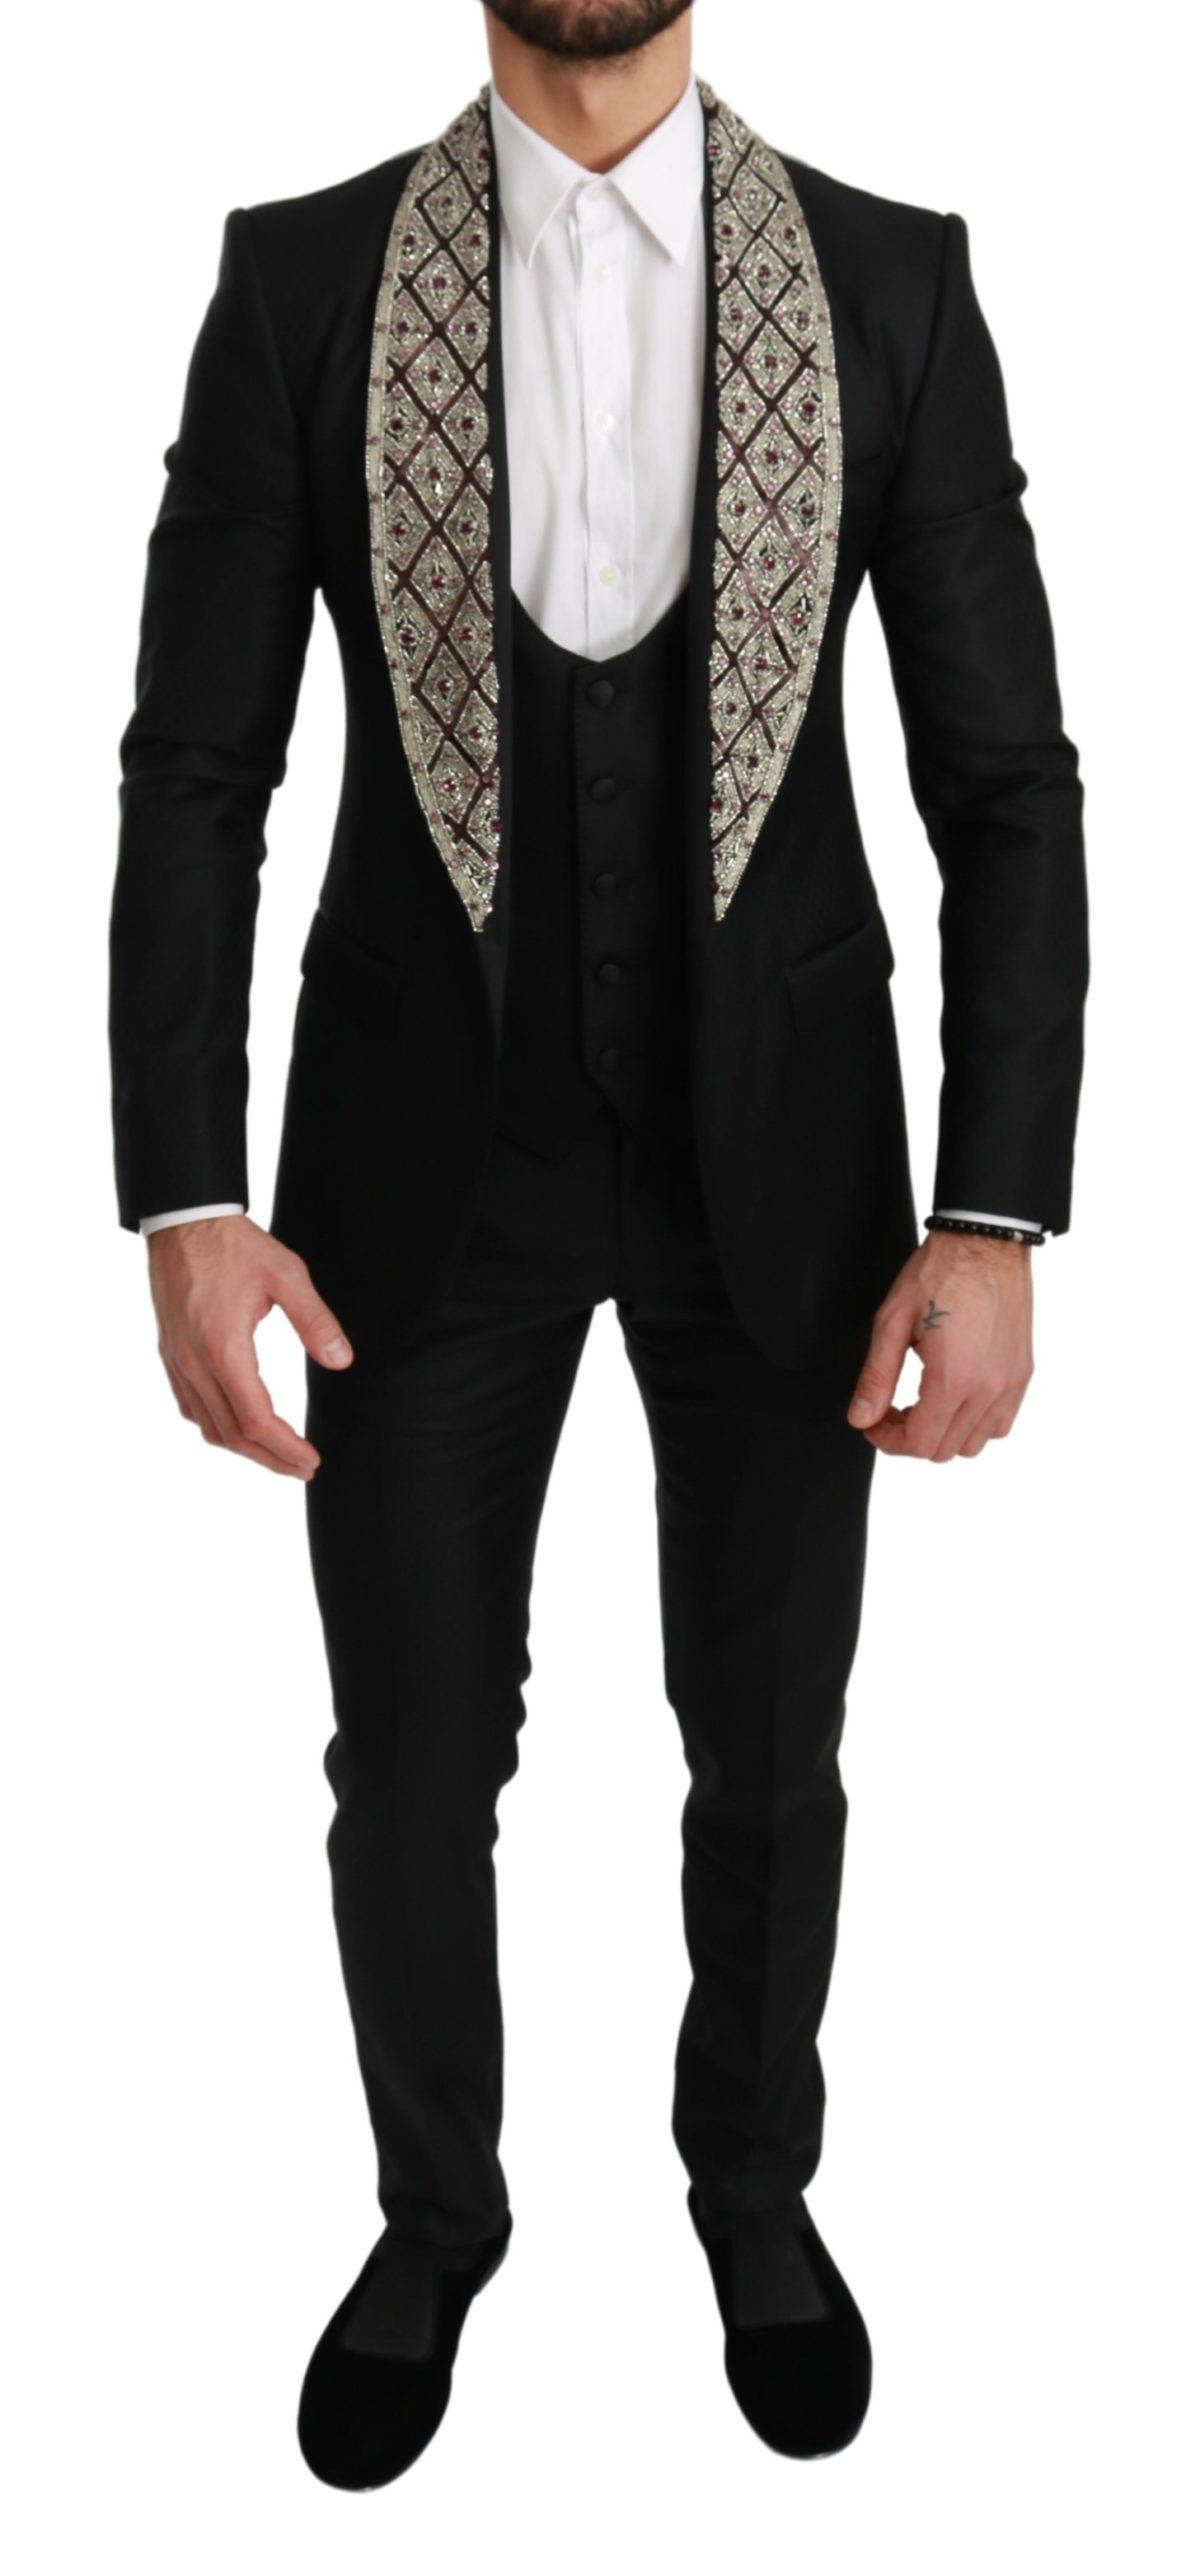 Dolce & Gabbana Men's Crystal Wool 3 Piece SICILIA Suit Black KOS1719 - IT44   XS